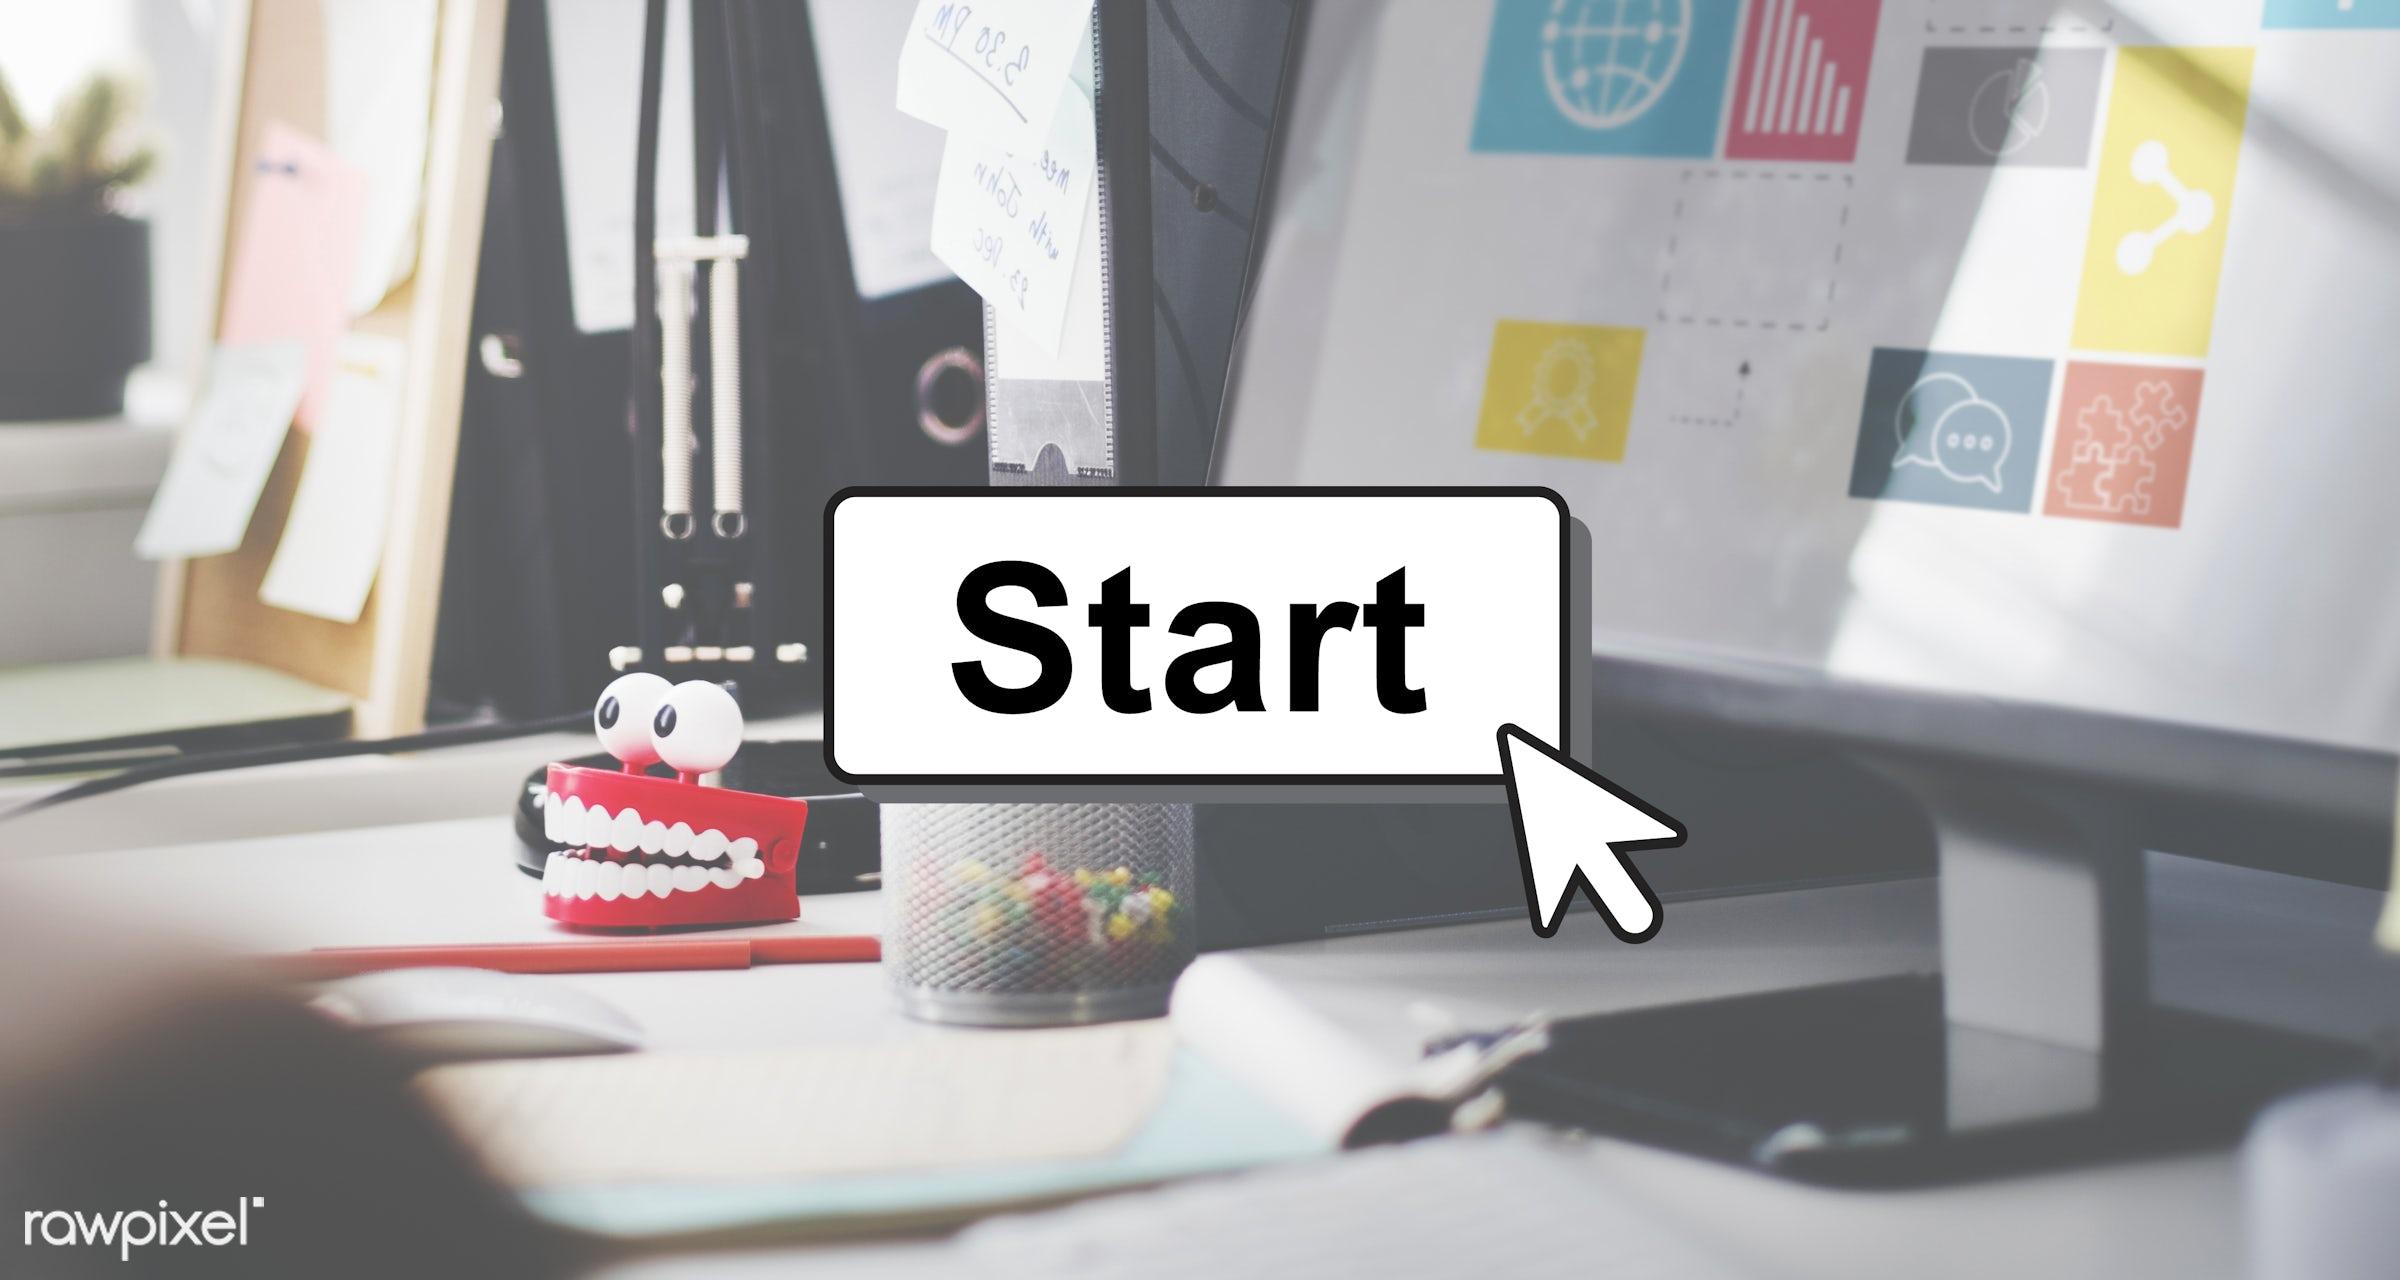 activation, begin, beginning, build, business, computer, computer screen, contemporary, desk, device, first, forward,...